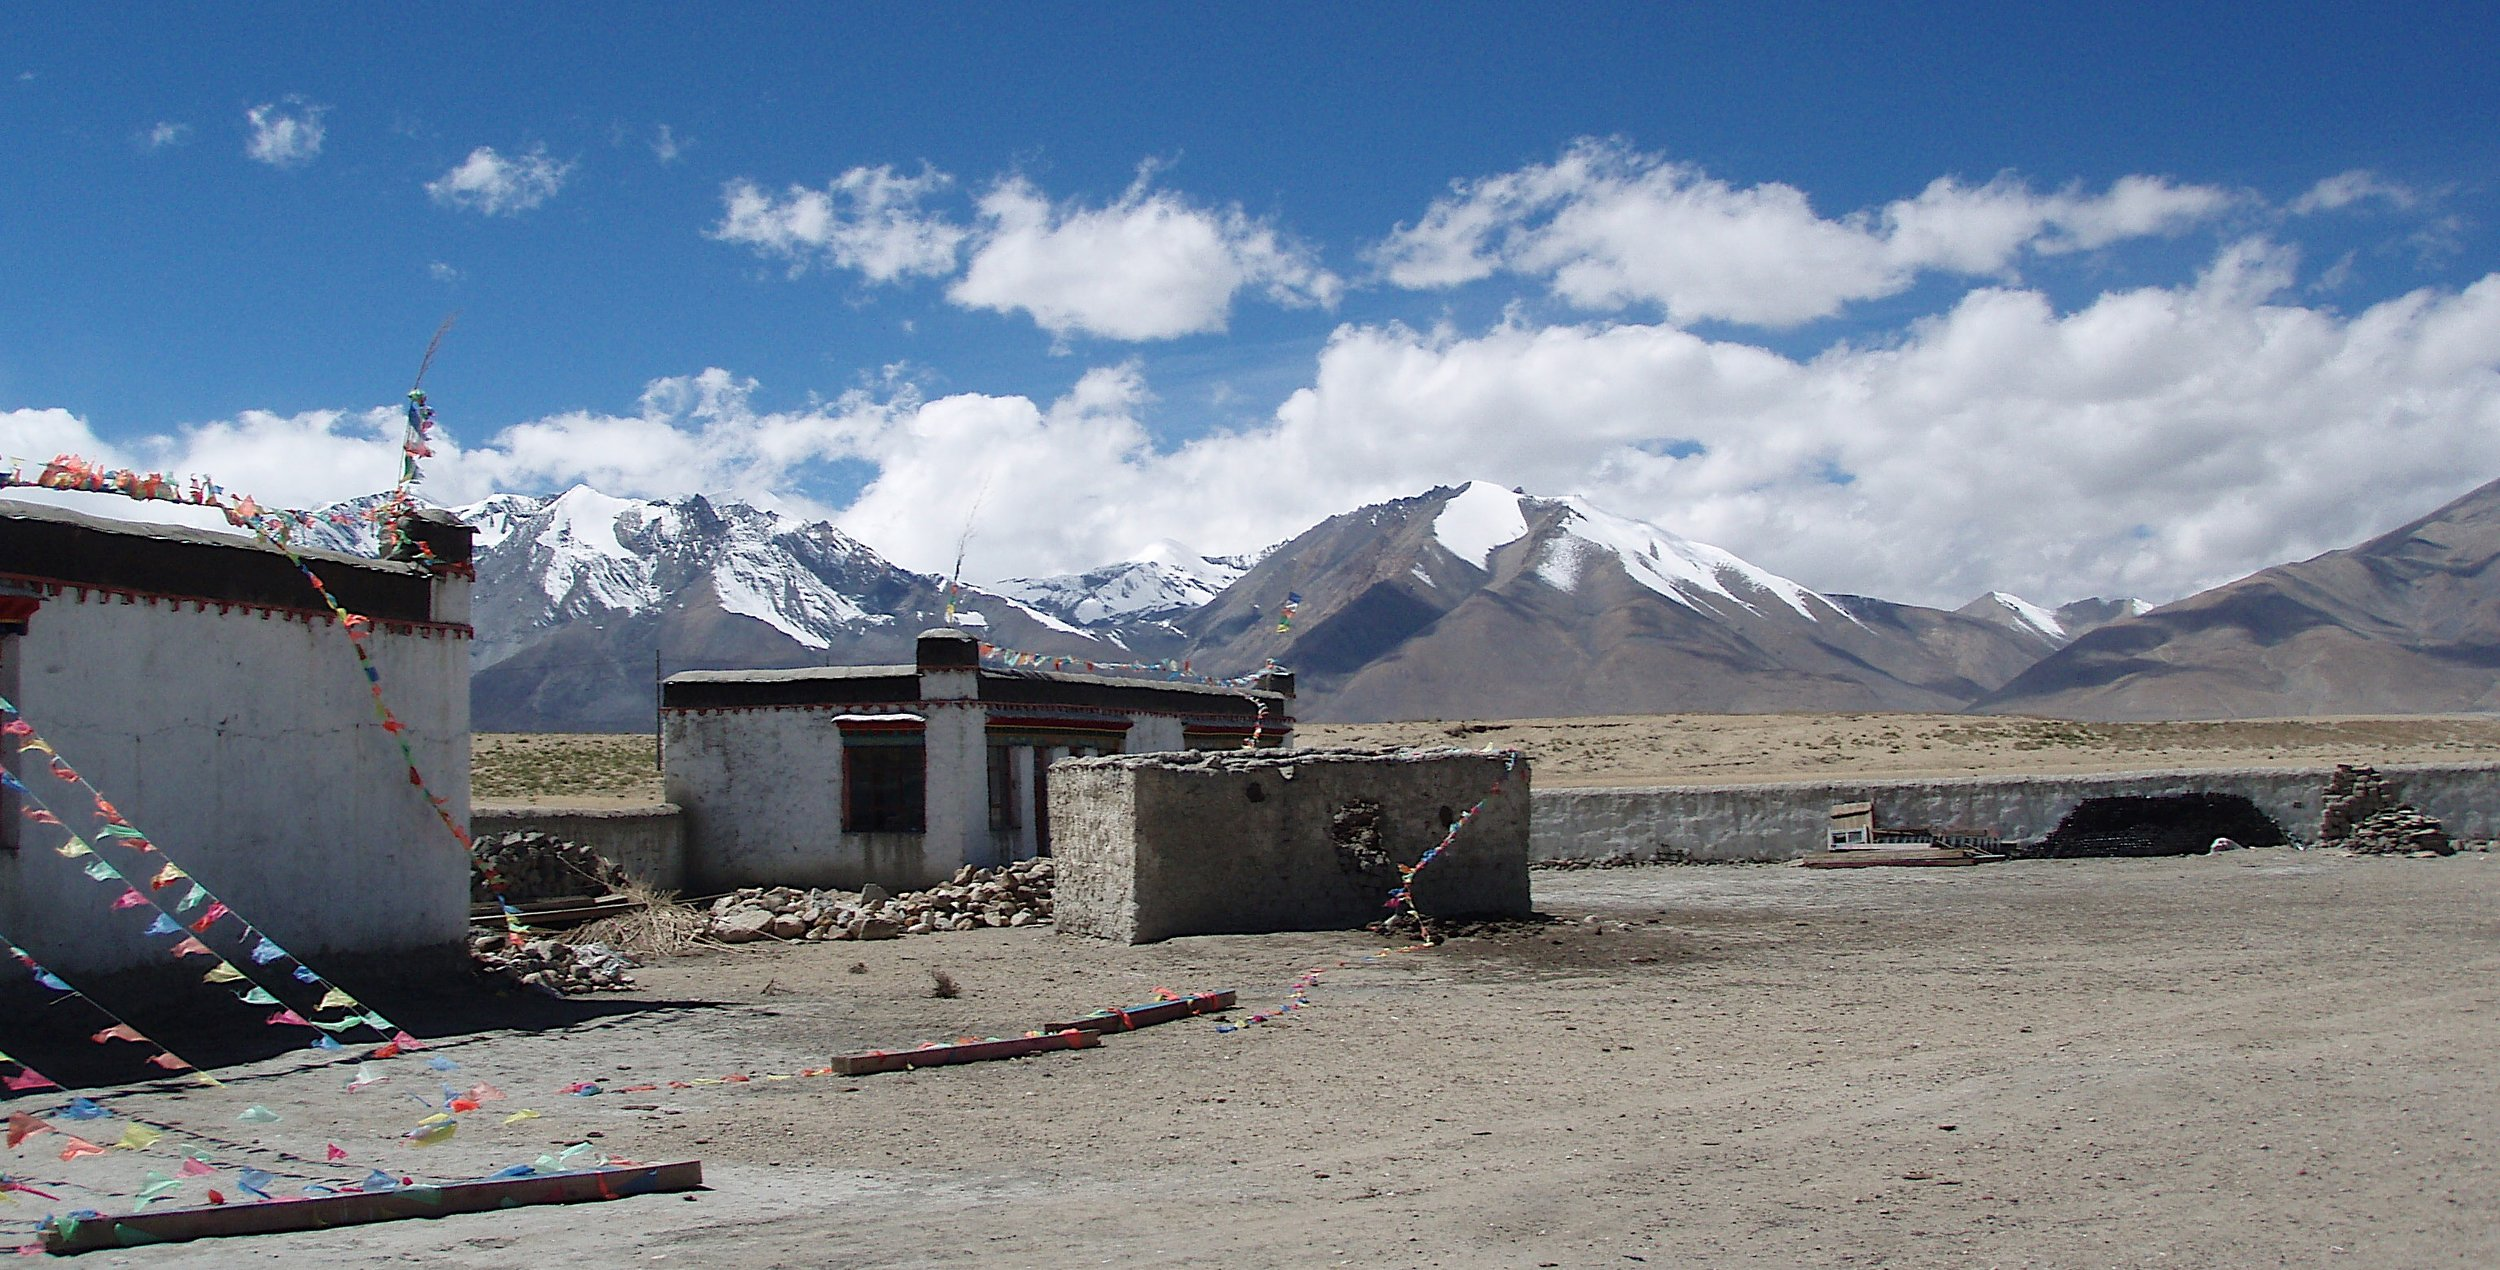 The view of the Langtang Range from Tibet near Lake Paiku Tso